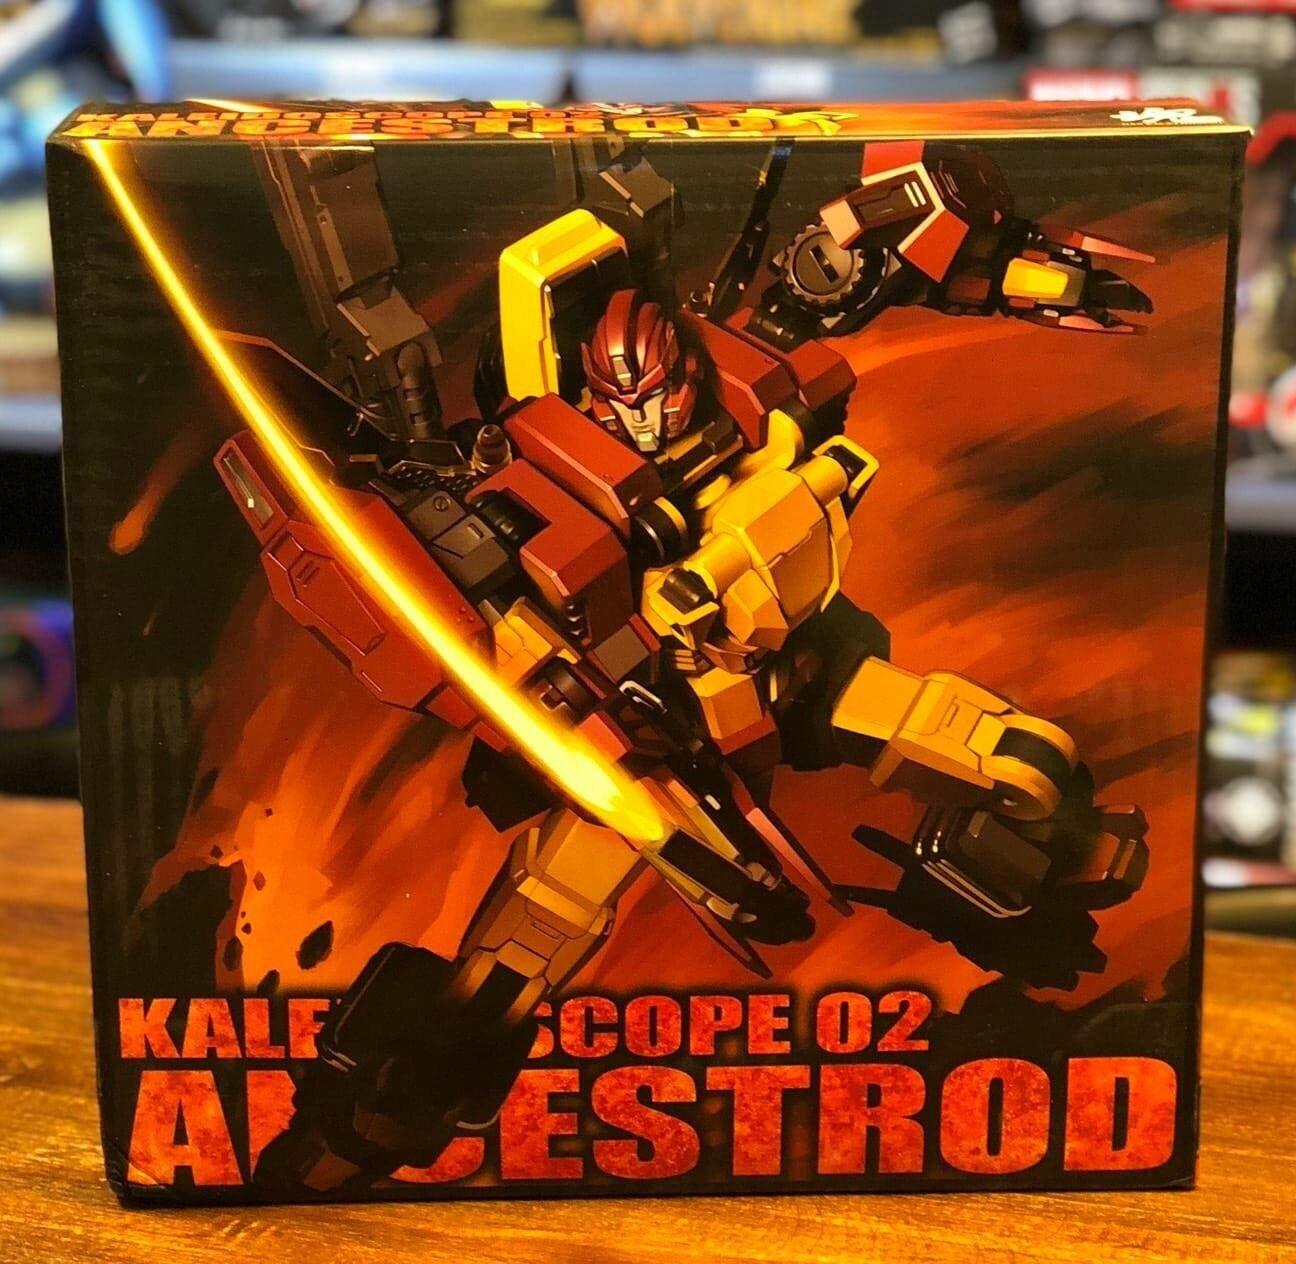 [Toys Hero] In Hand DX9 K2 AncestRod supplement Tianshi tiantianshi hot Rod